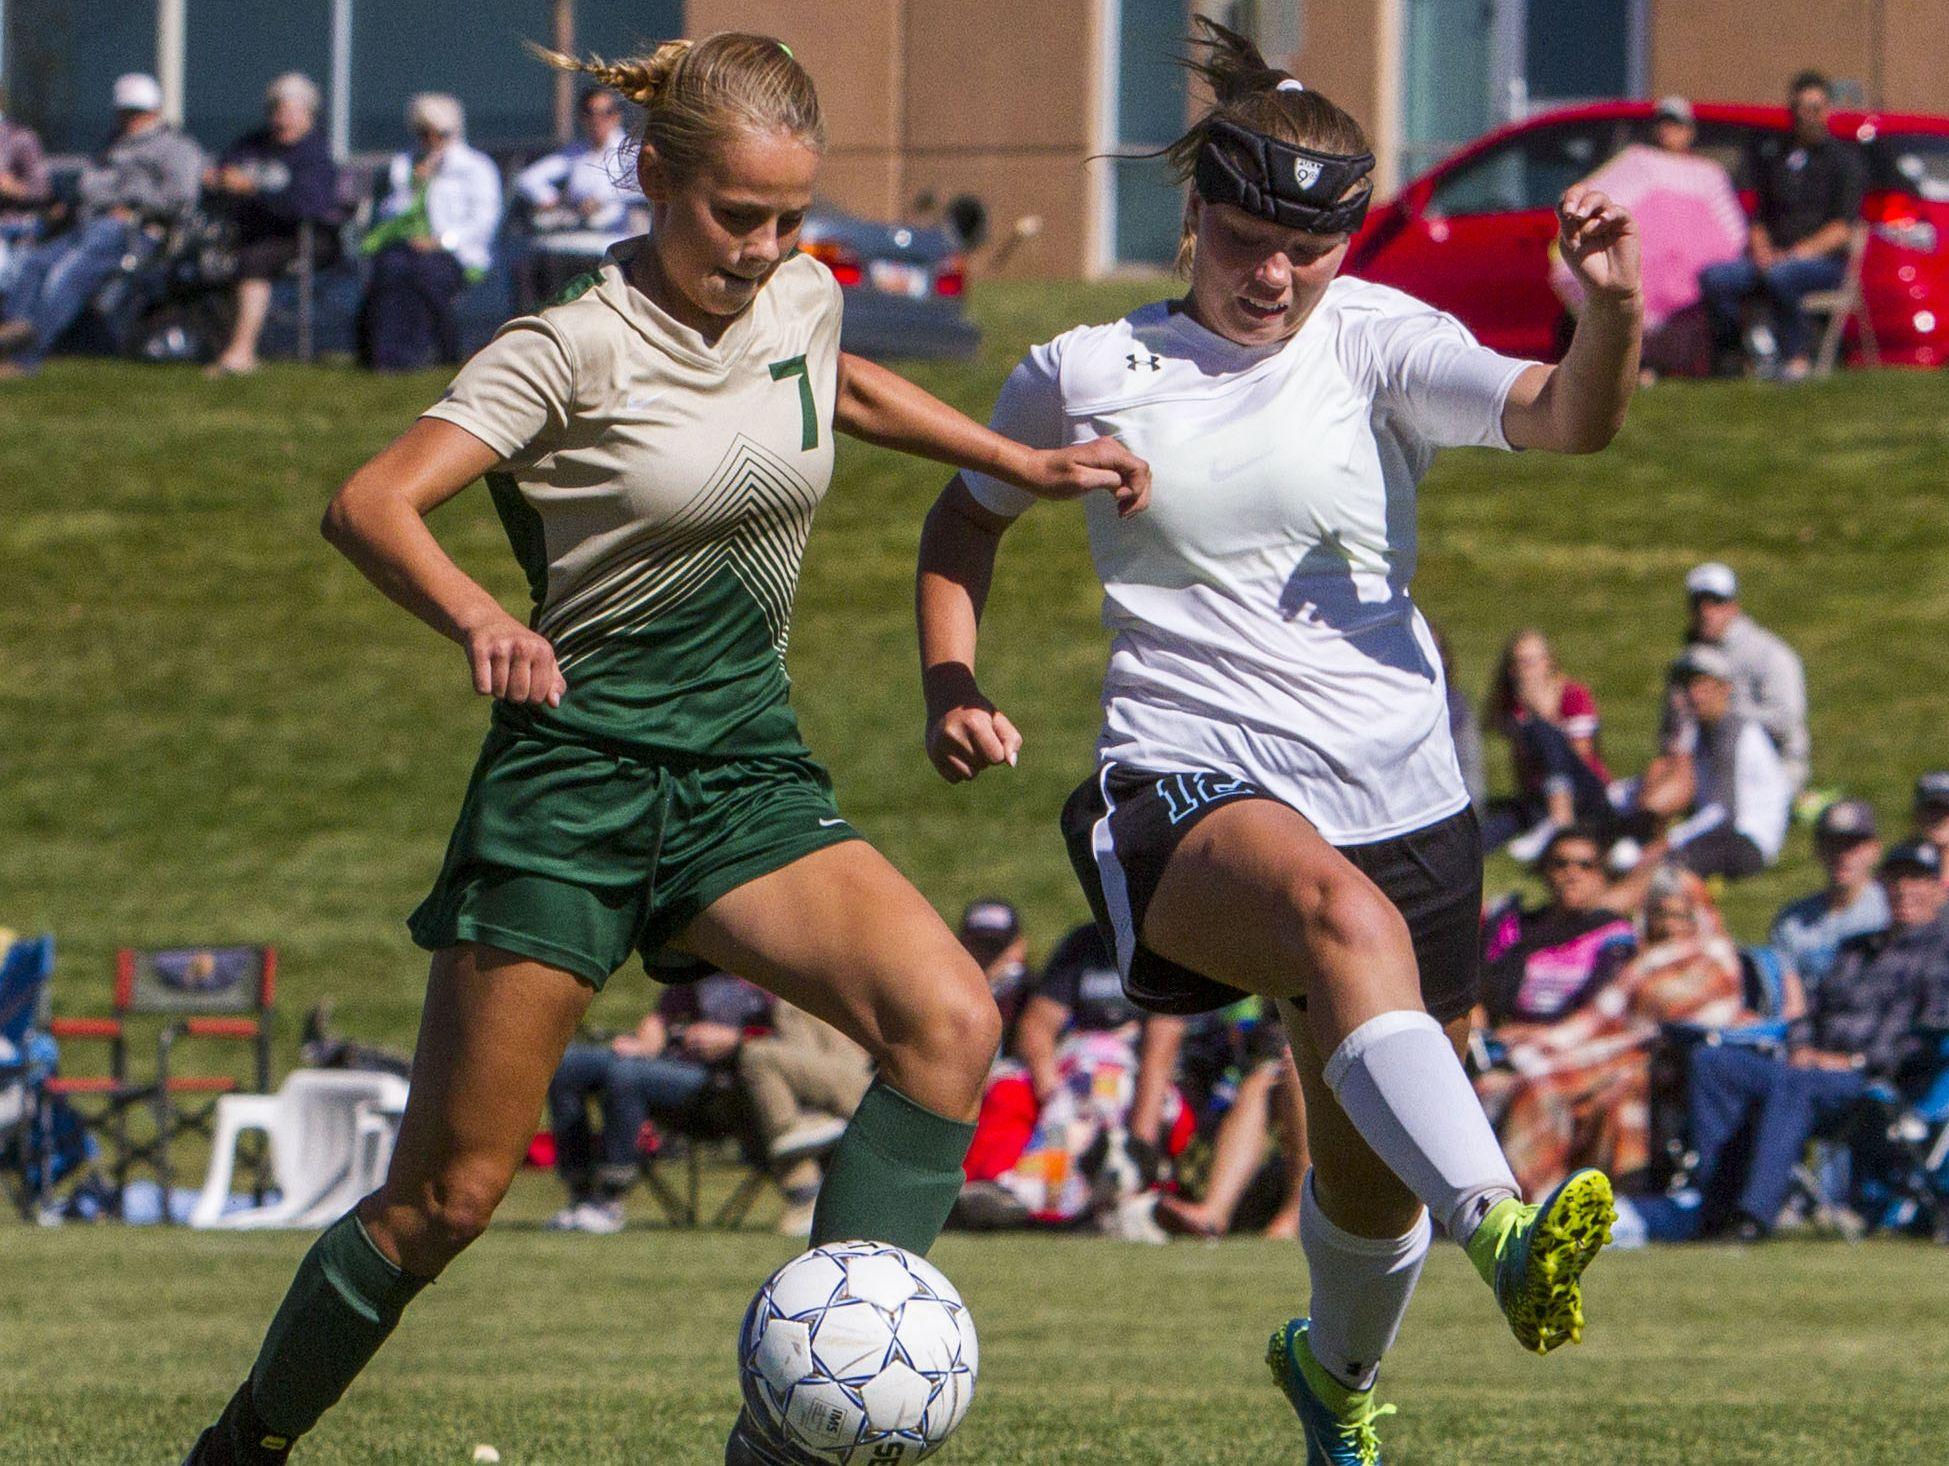 High school girls soccer playoffs: Snow Canyon at Canyon View in Cedar City, Saturday, Oct. 15, 2016. Final score: SCHS 2, CVHS 1 OT.